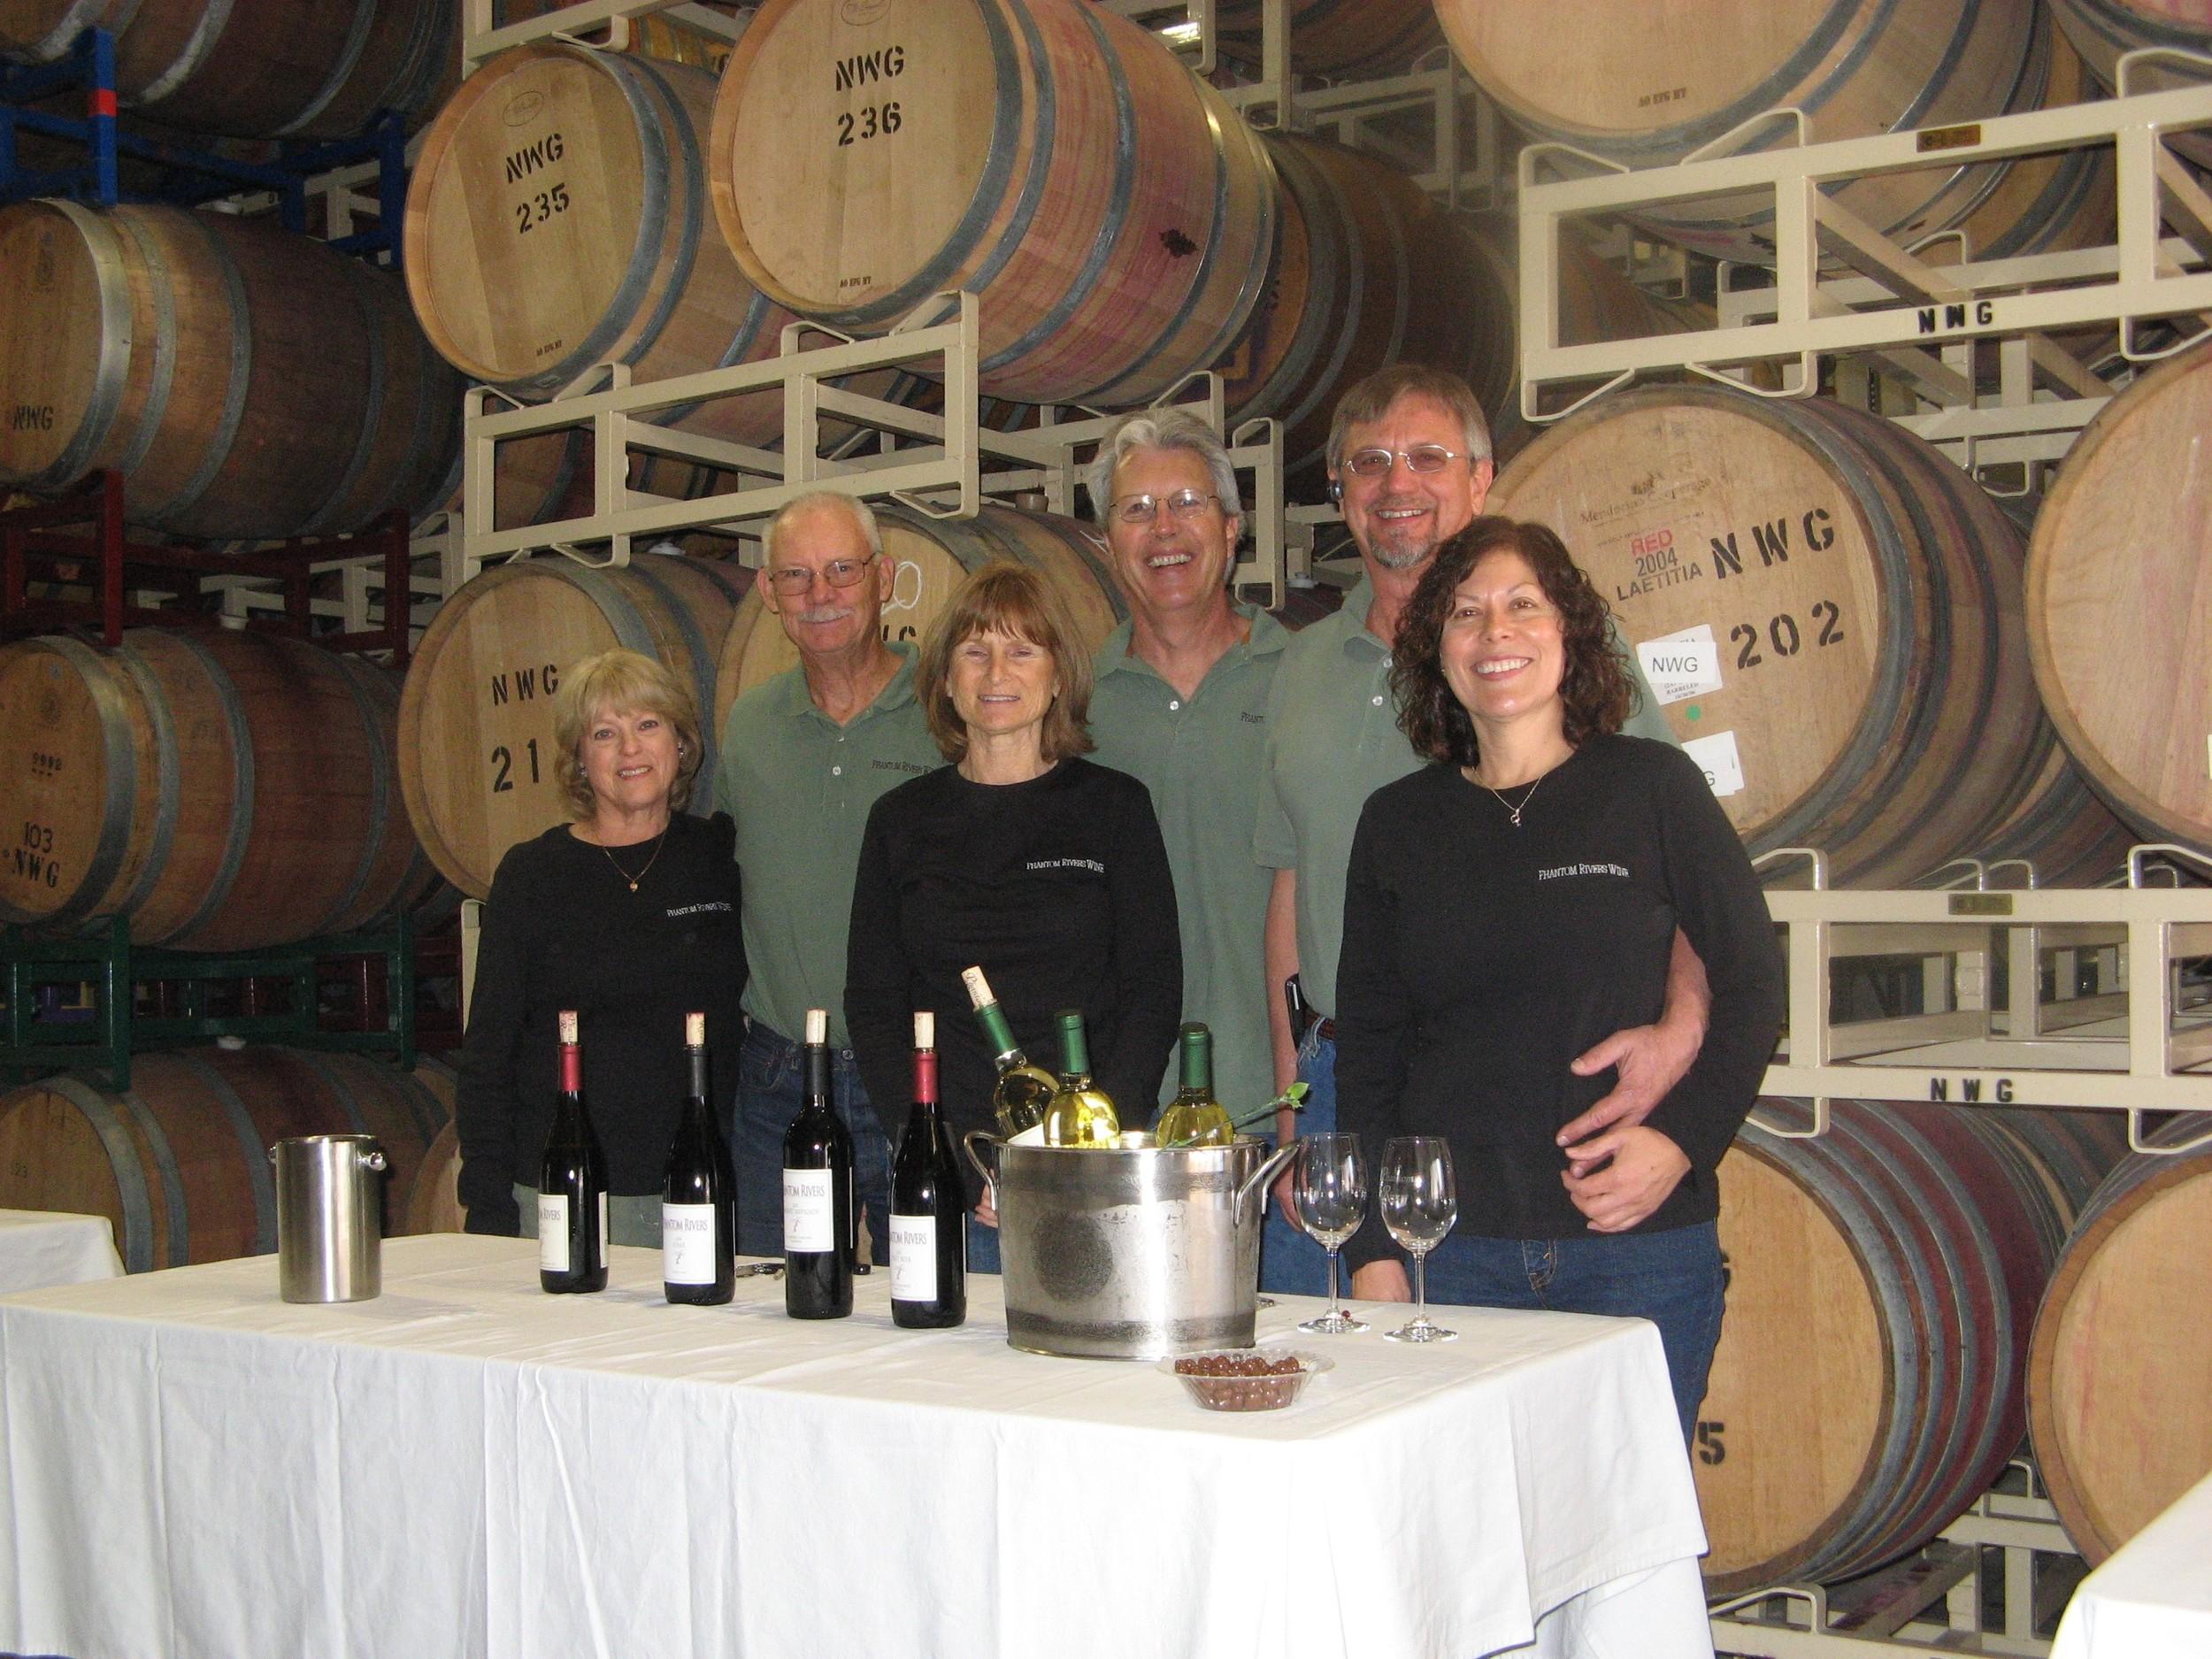 (L-R)John & Linda Thunen, Gary & Diana Smith, Steve & Sue Mathis